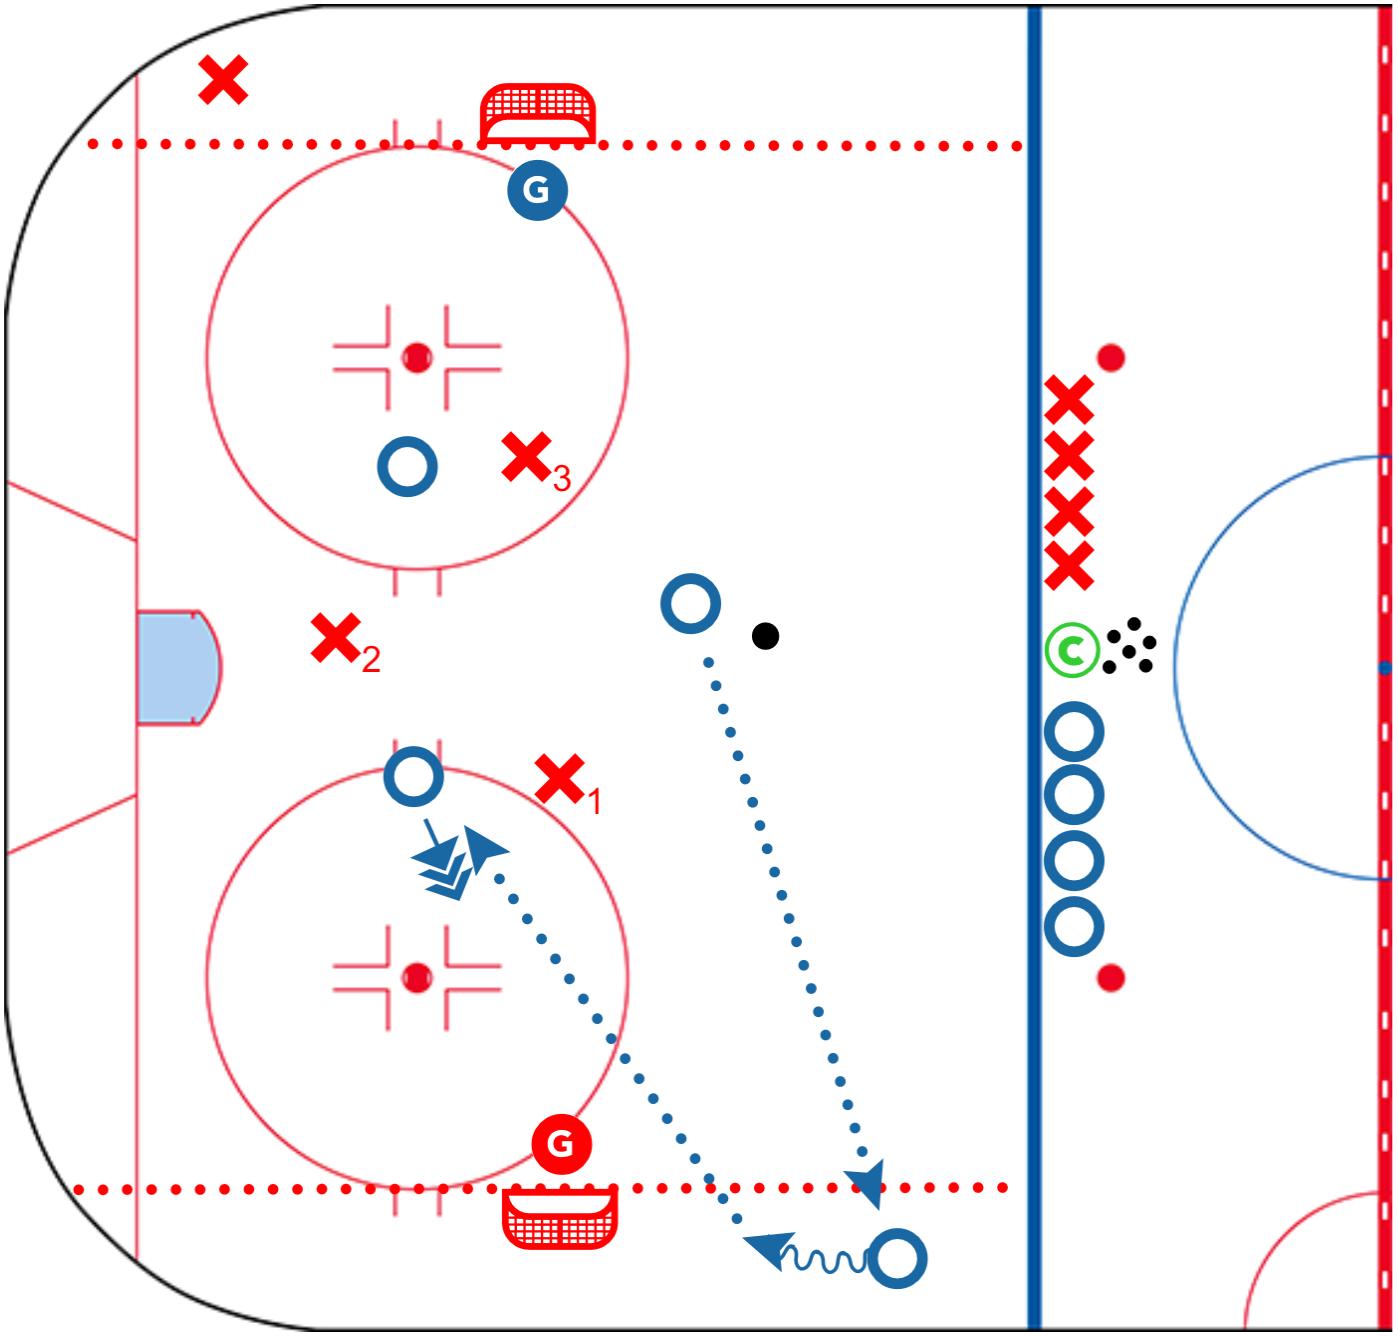 small-area-game-wayne-gretzky-CoachThem